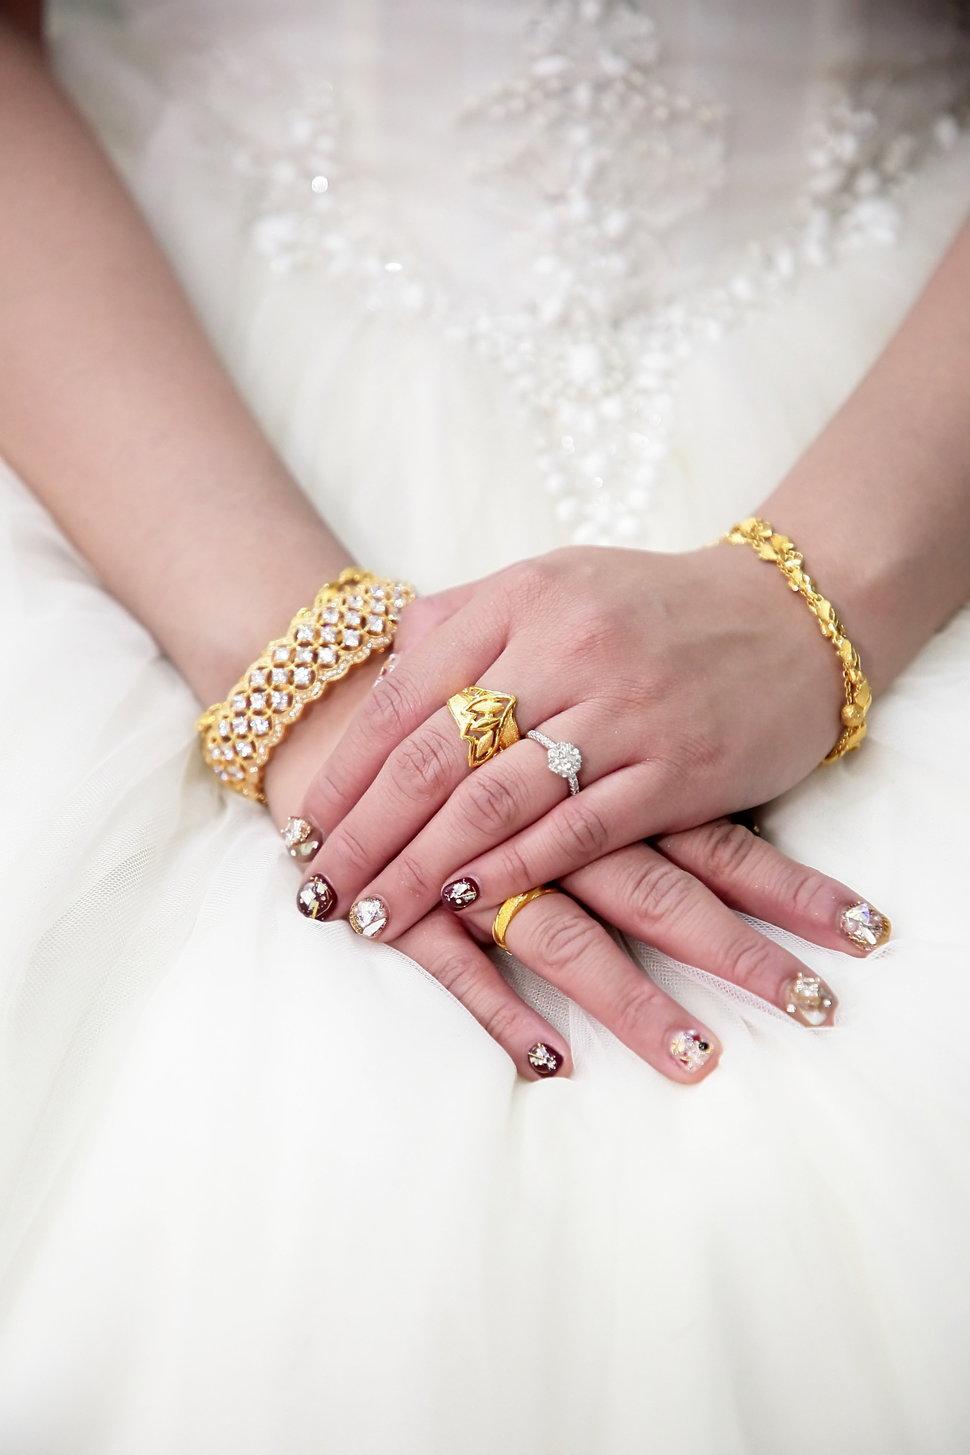 201902230306 - Loveliness ♥ wedding - 結婚吧